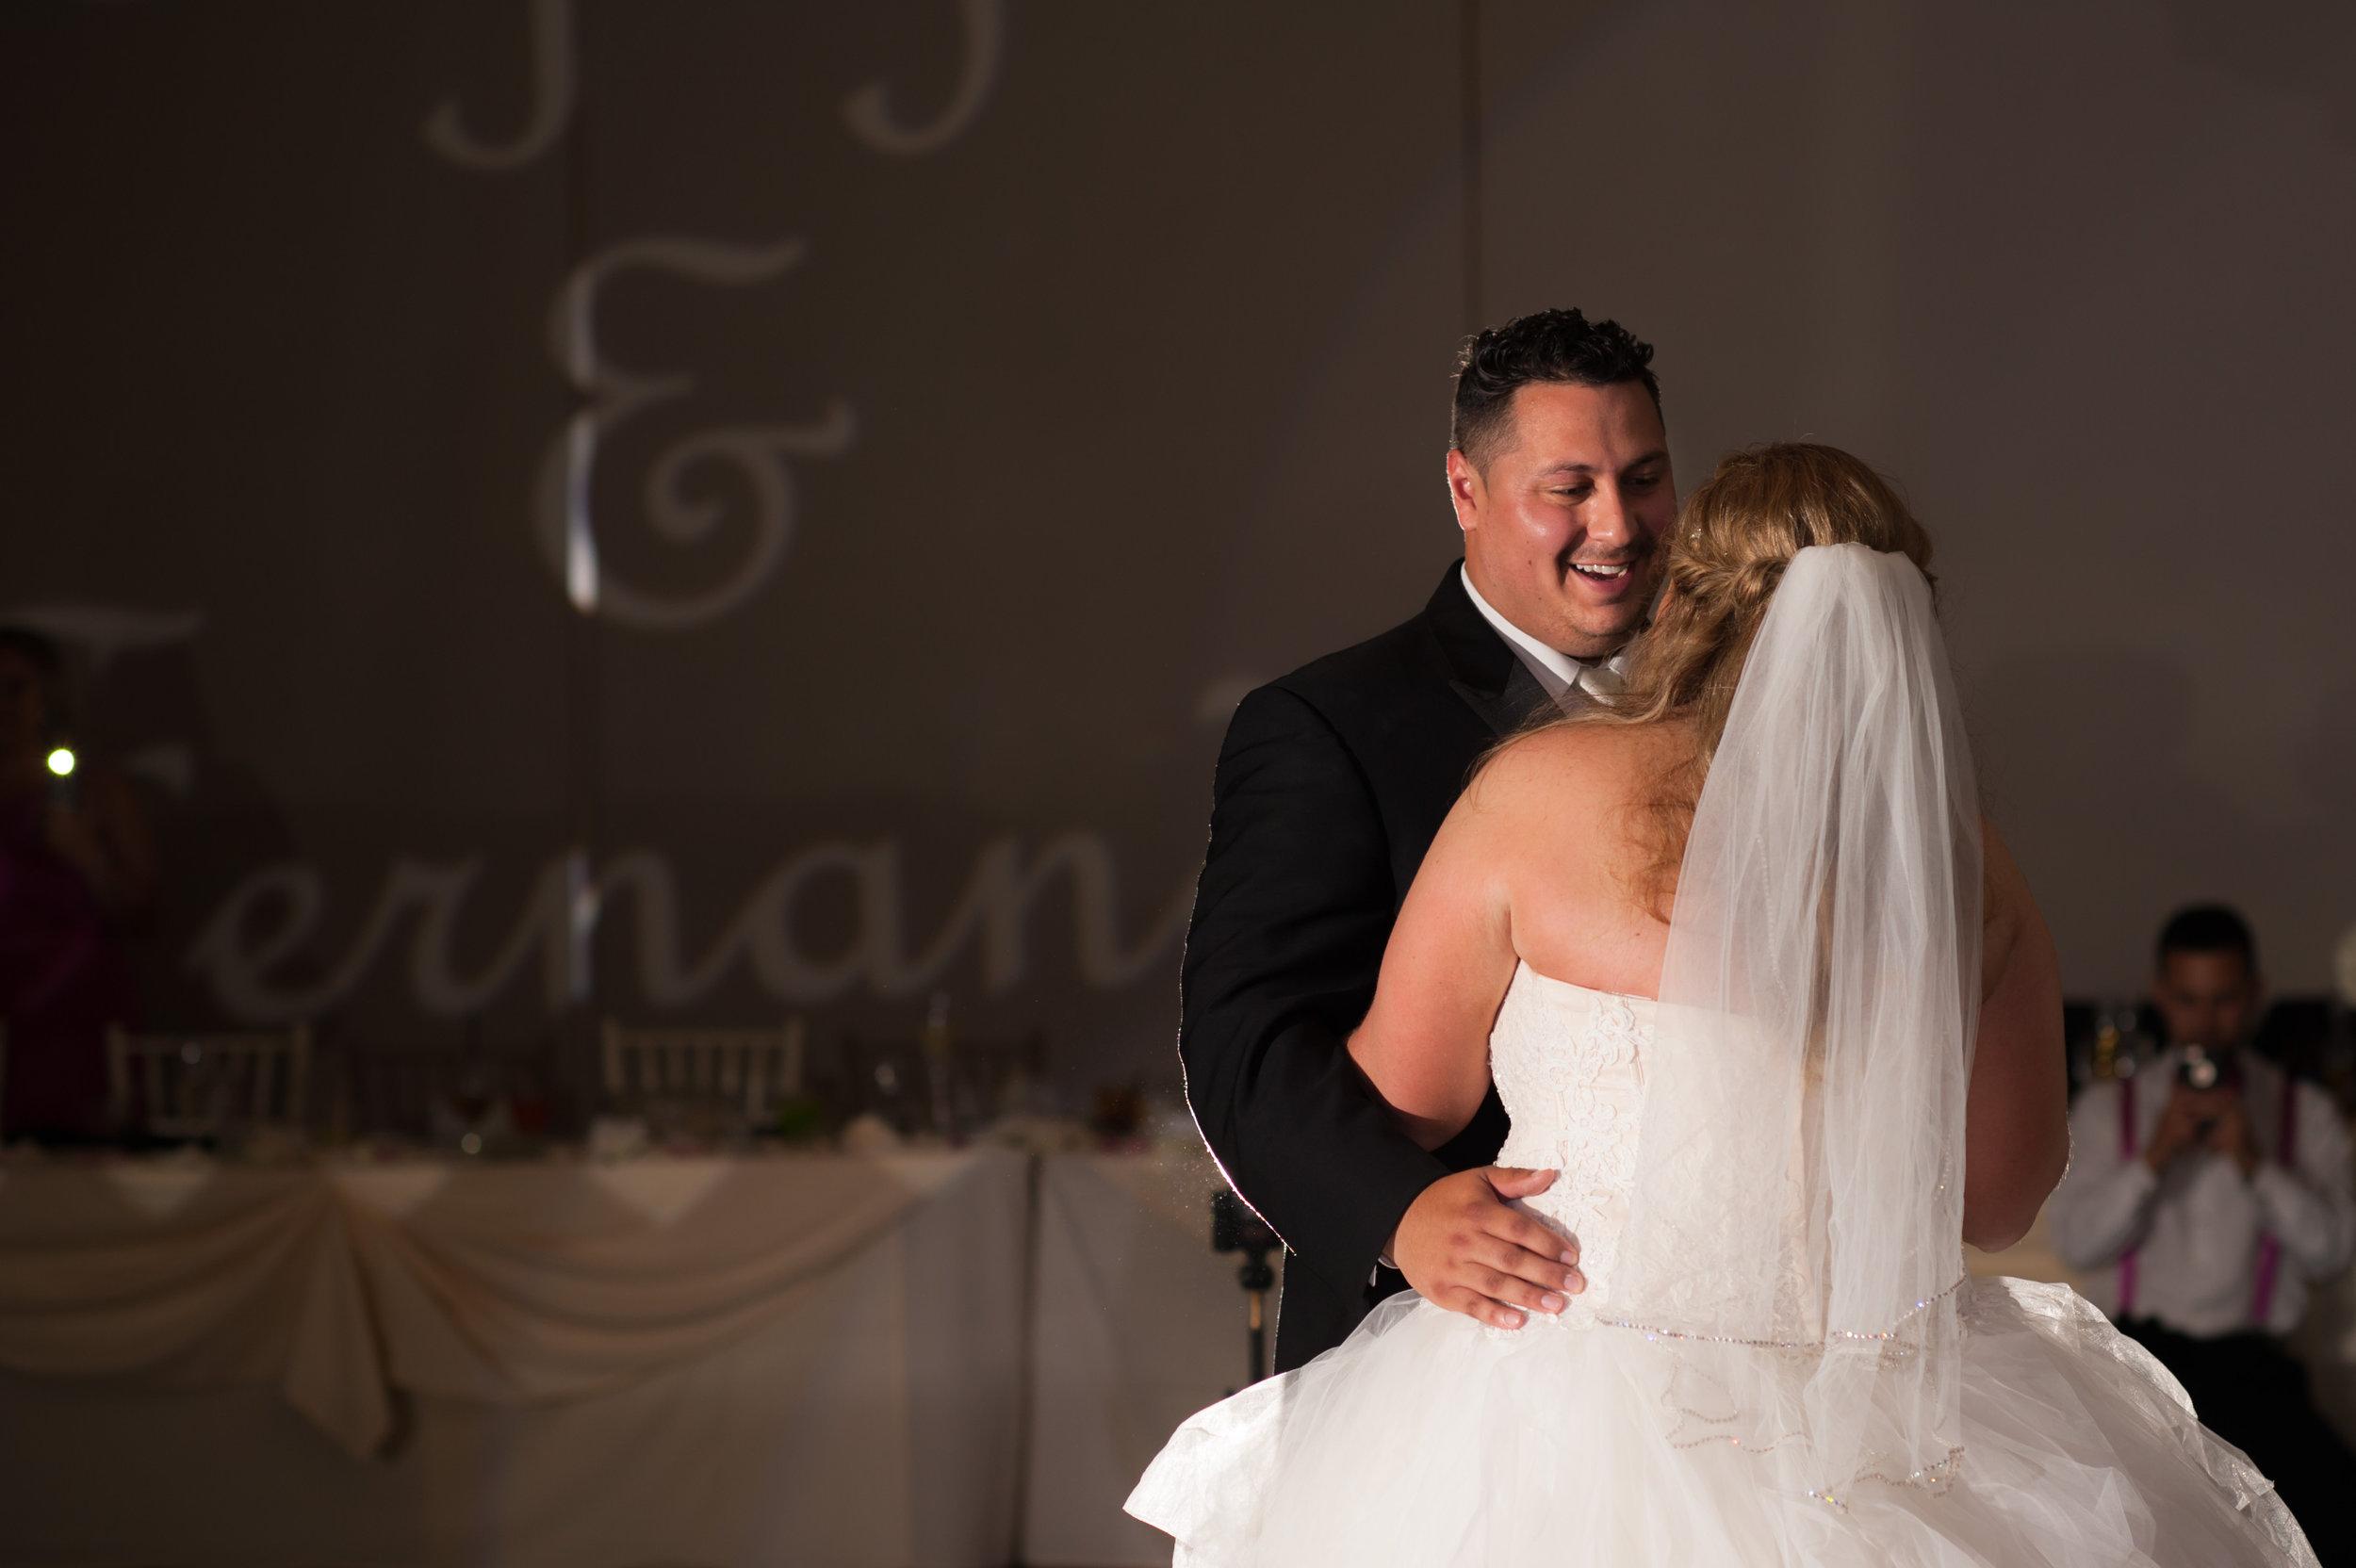 lyndzie-javier-030-arden-hills-sacramento-wedding-photographer-katherine-nicole-photography.JPG